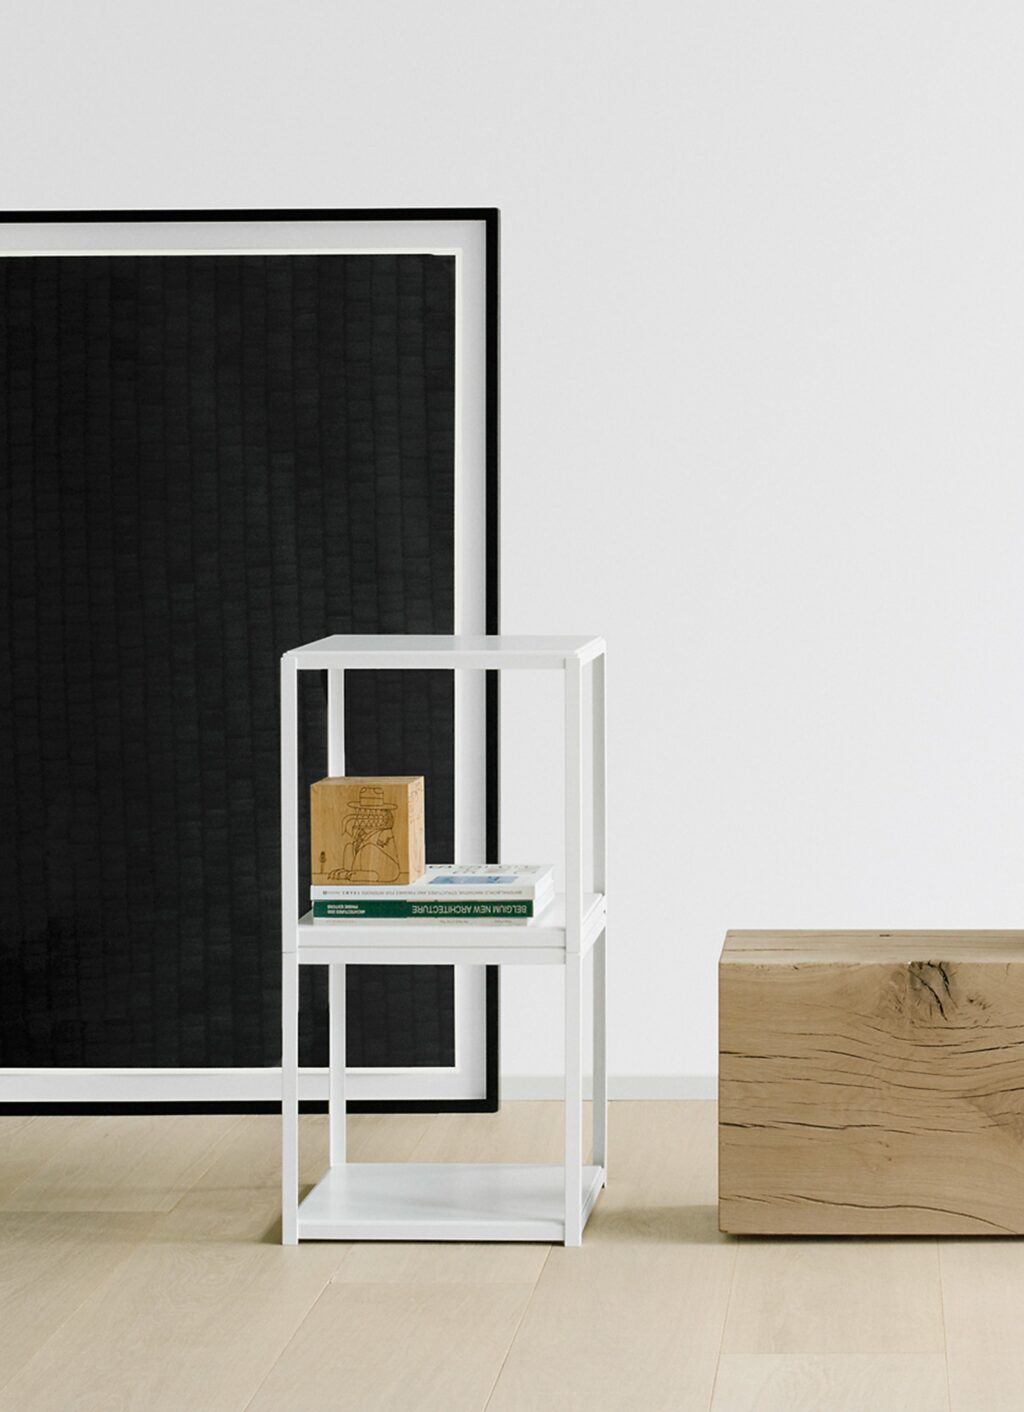 e15 - Ferdinand Kramer - Fortyforty - Stackable side table - Powder coated steel